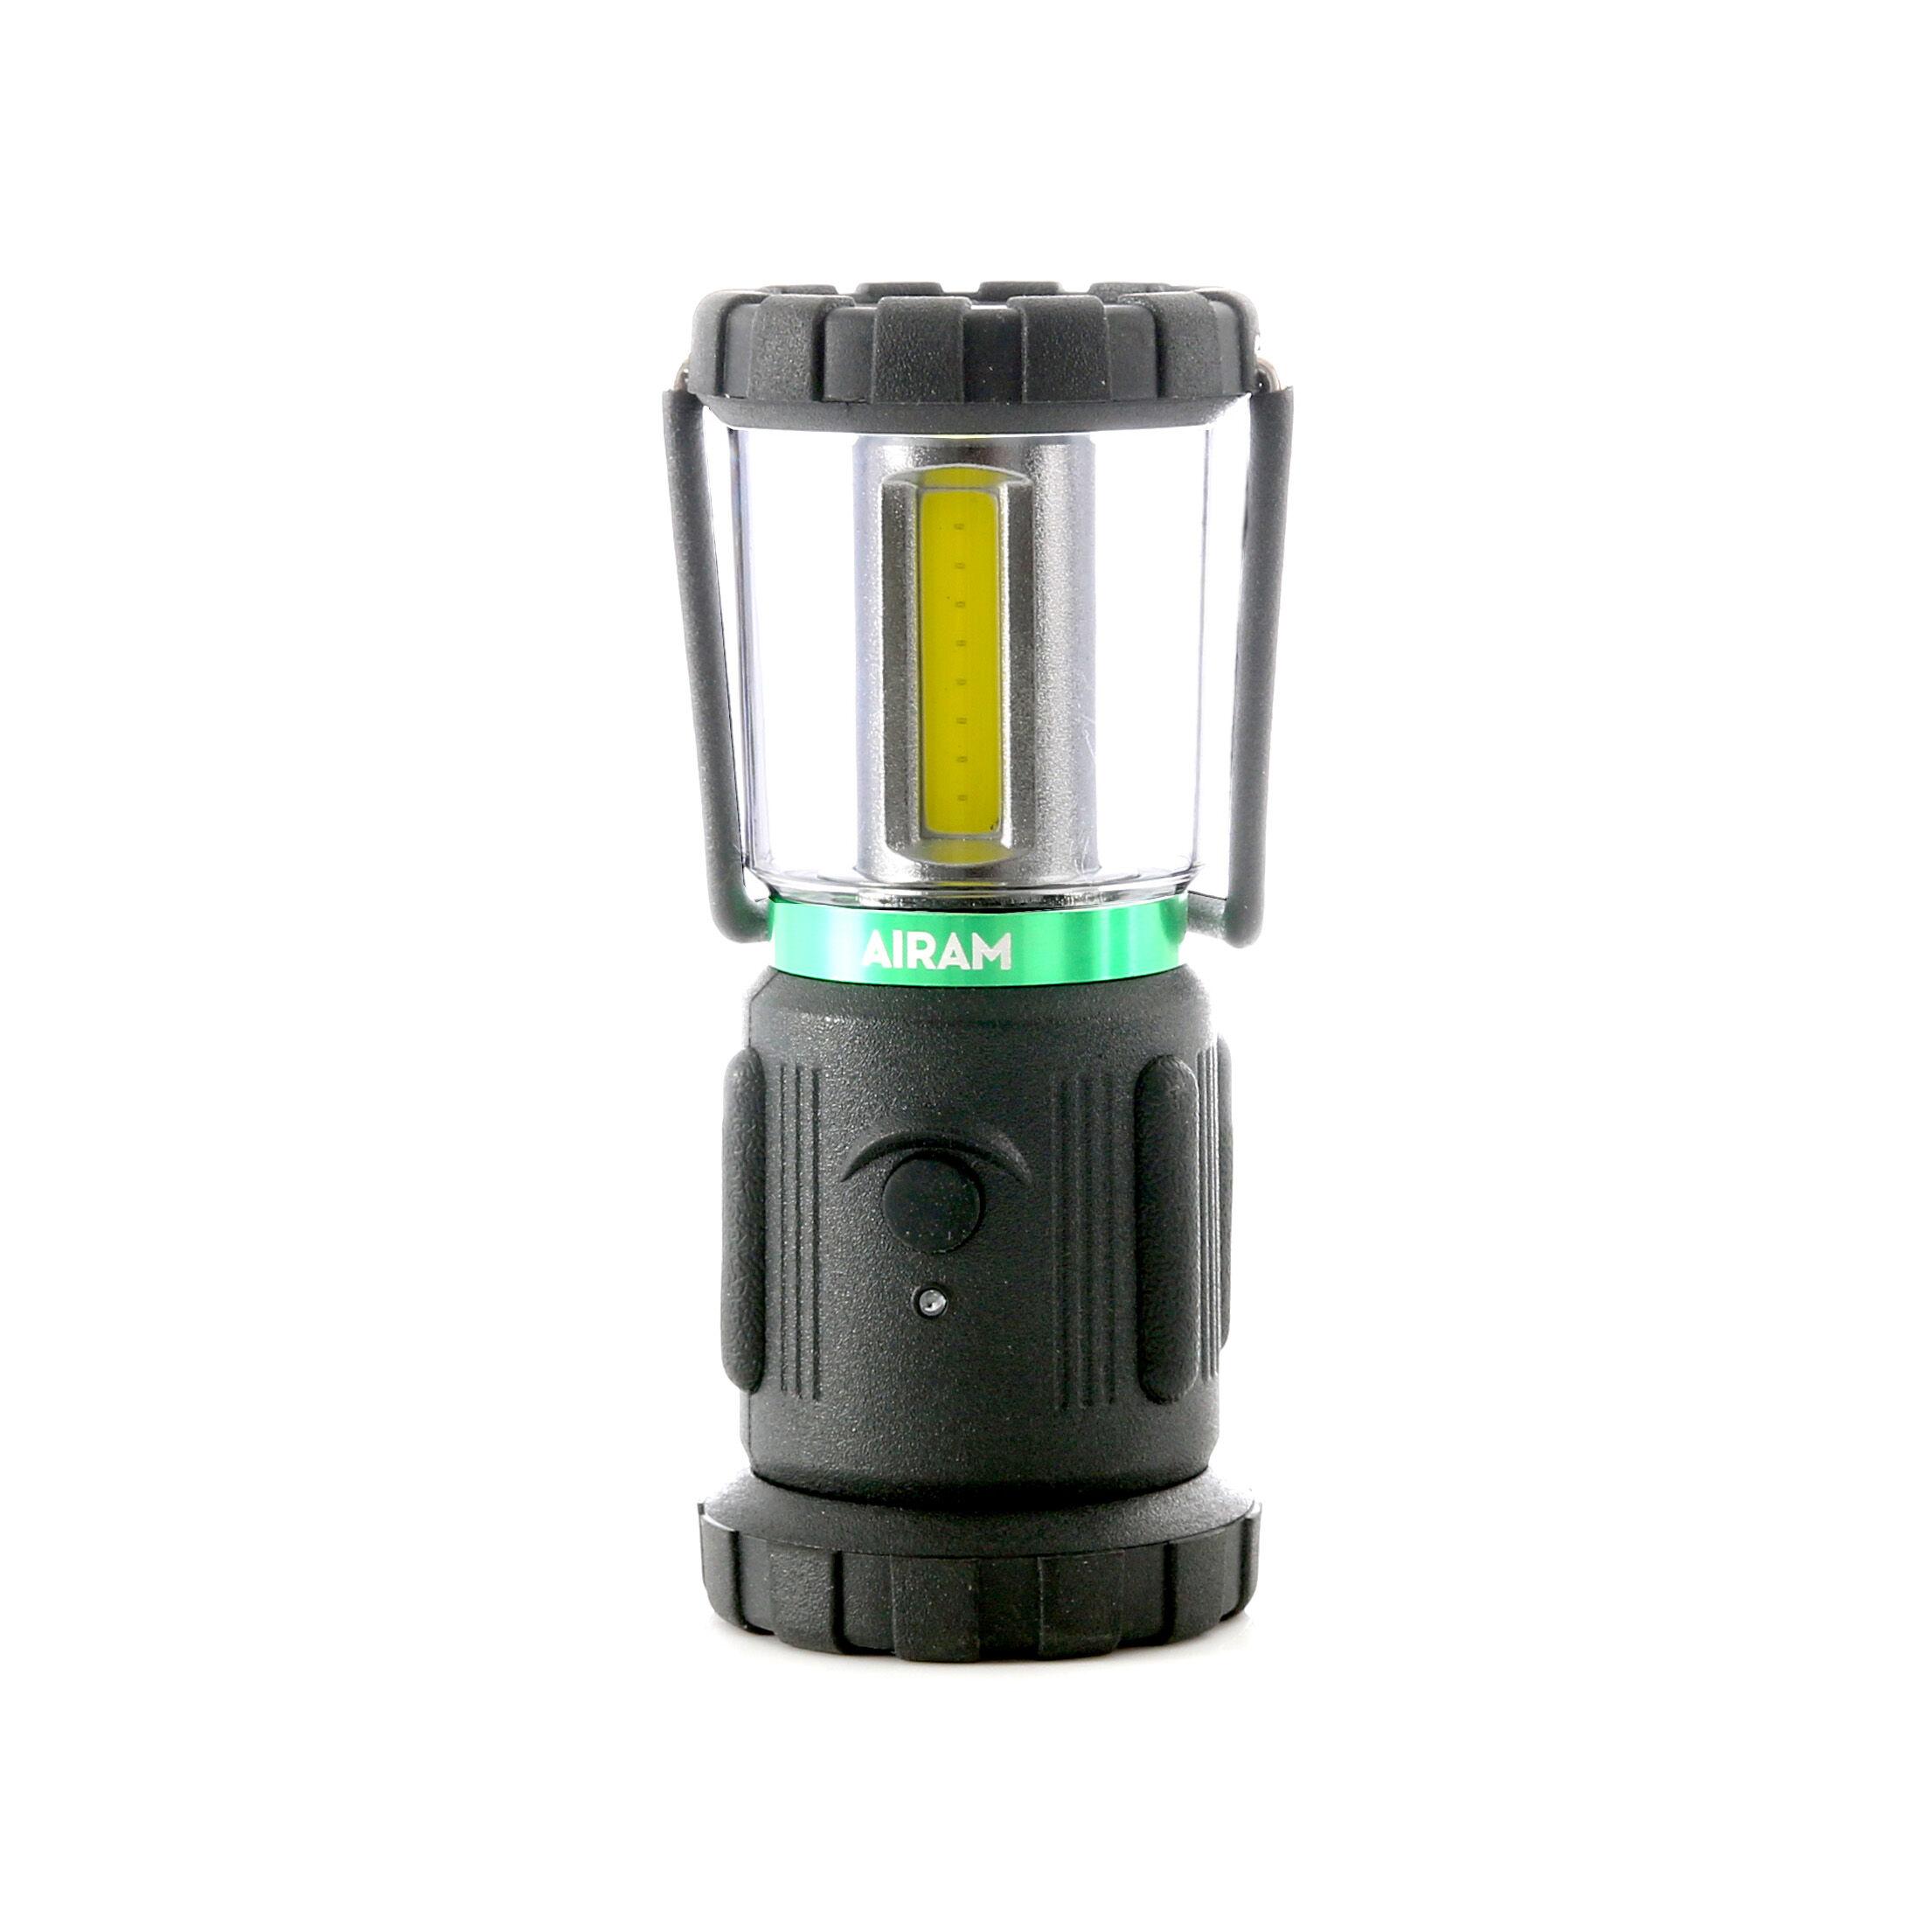 AIRAM LED-lyhty, Airam Camper S,150lm